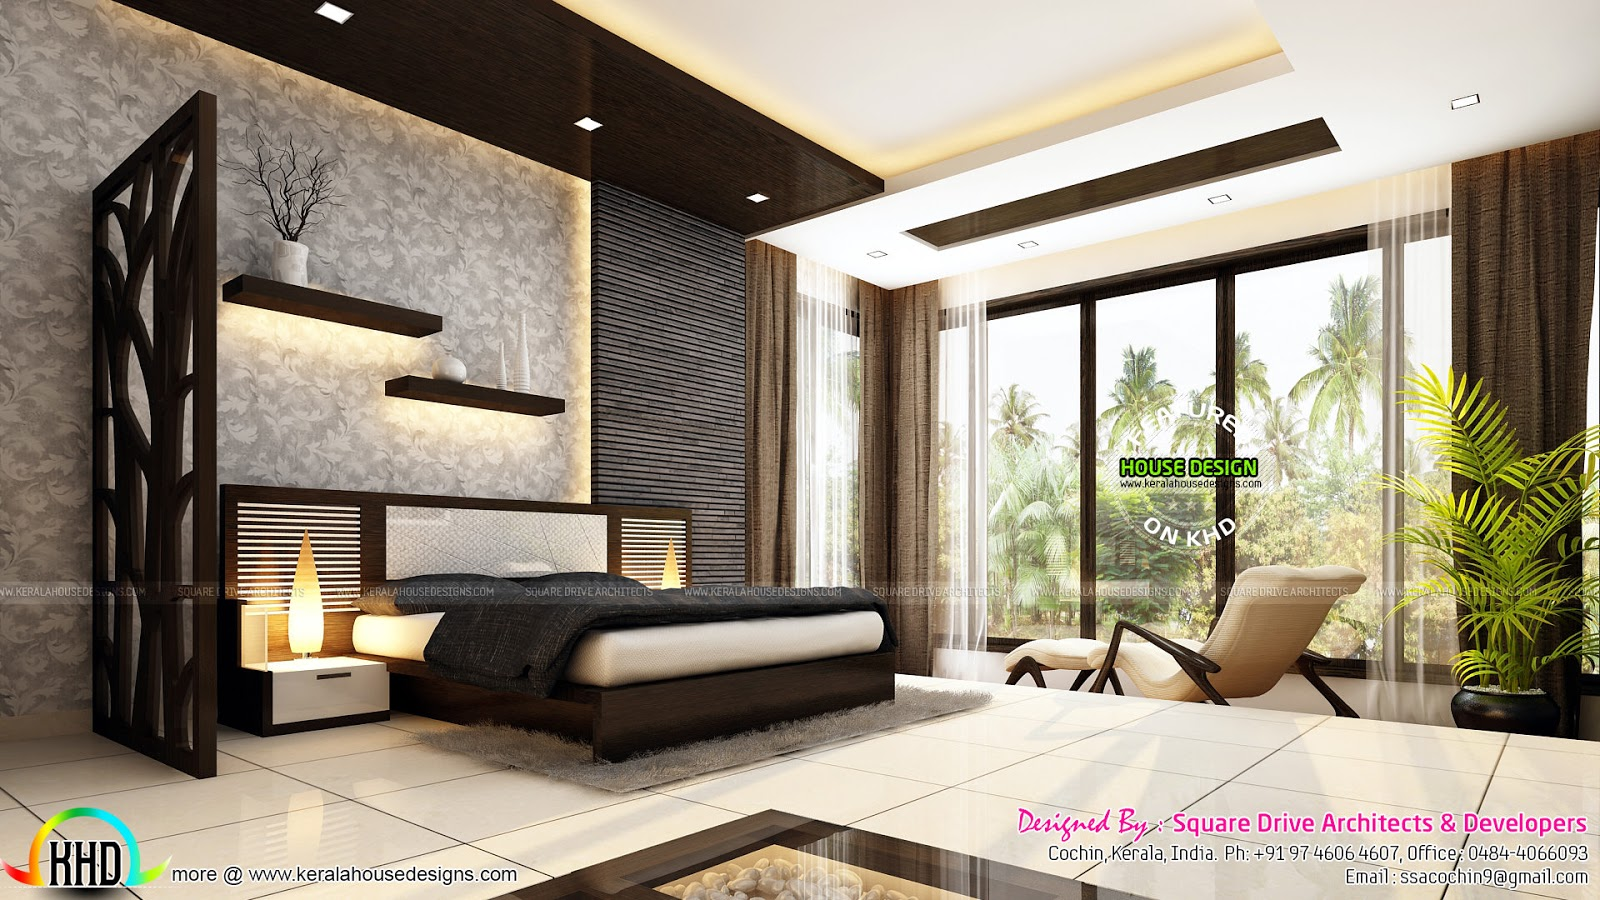 Very beautiful modern interior designs - Kerala home ... on Beautiful Room  id=80732